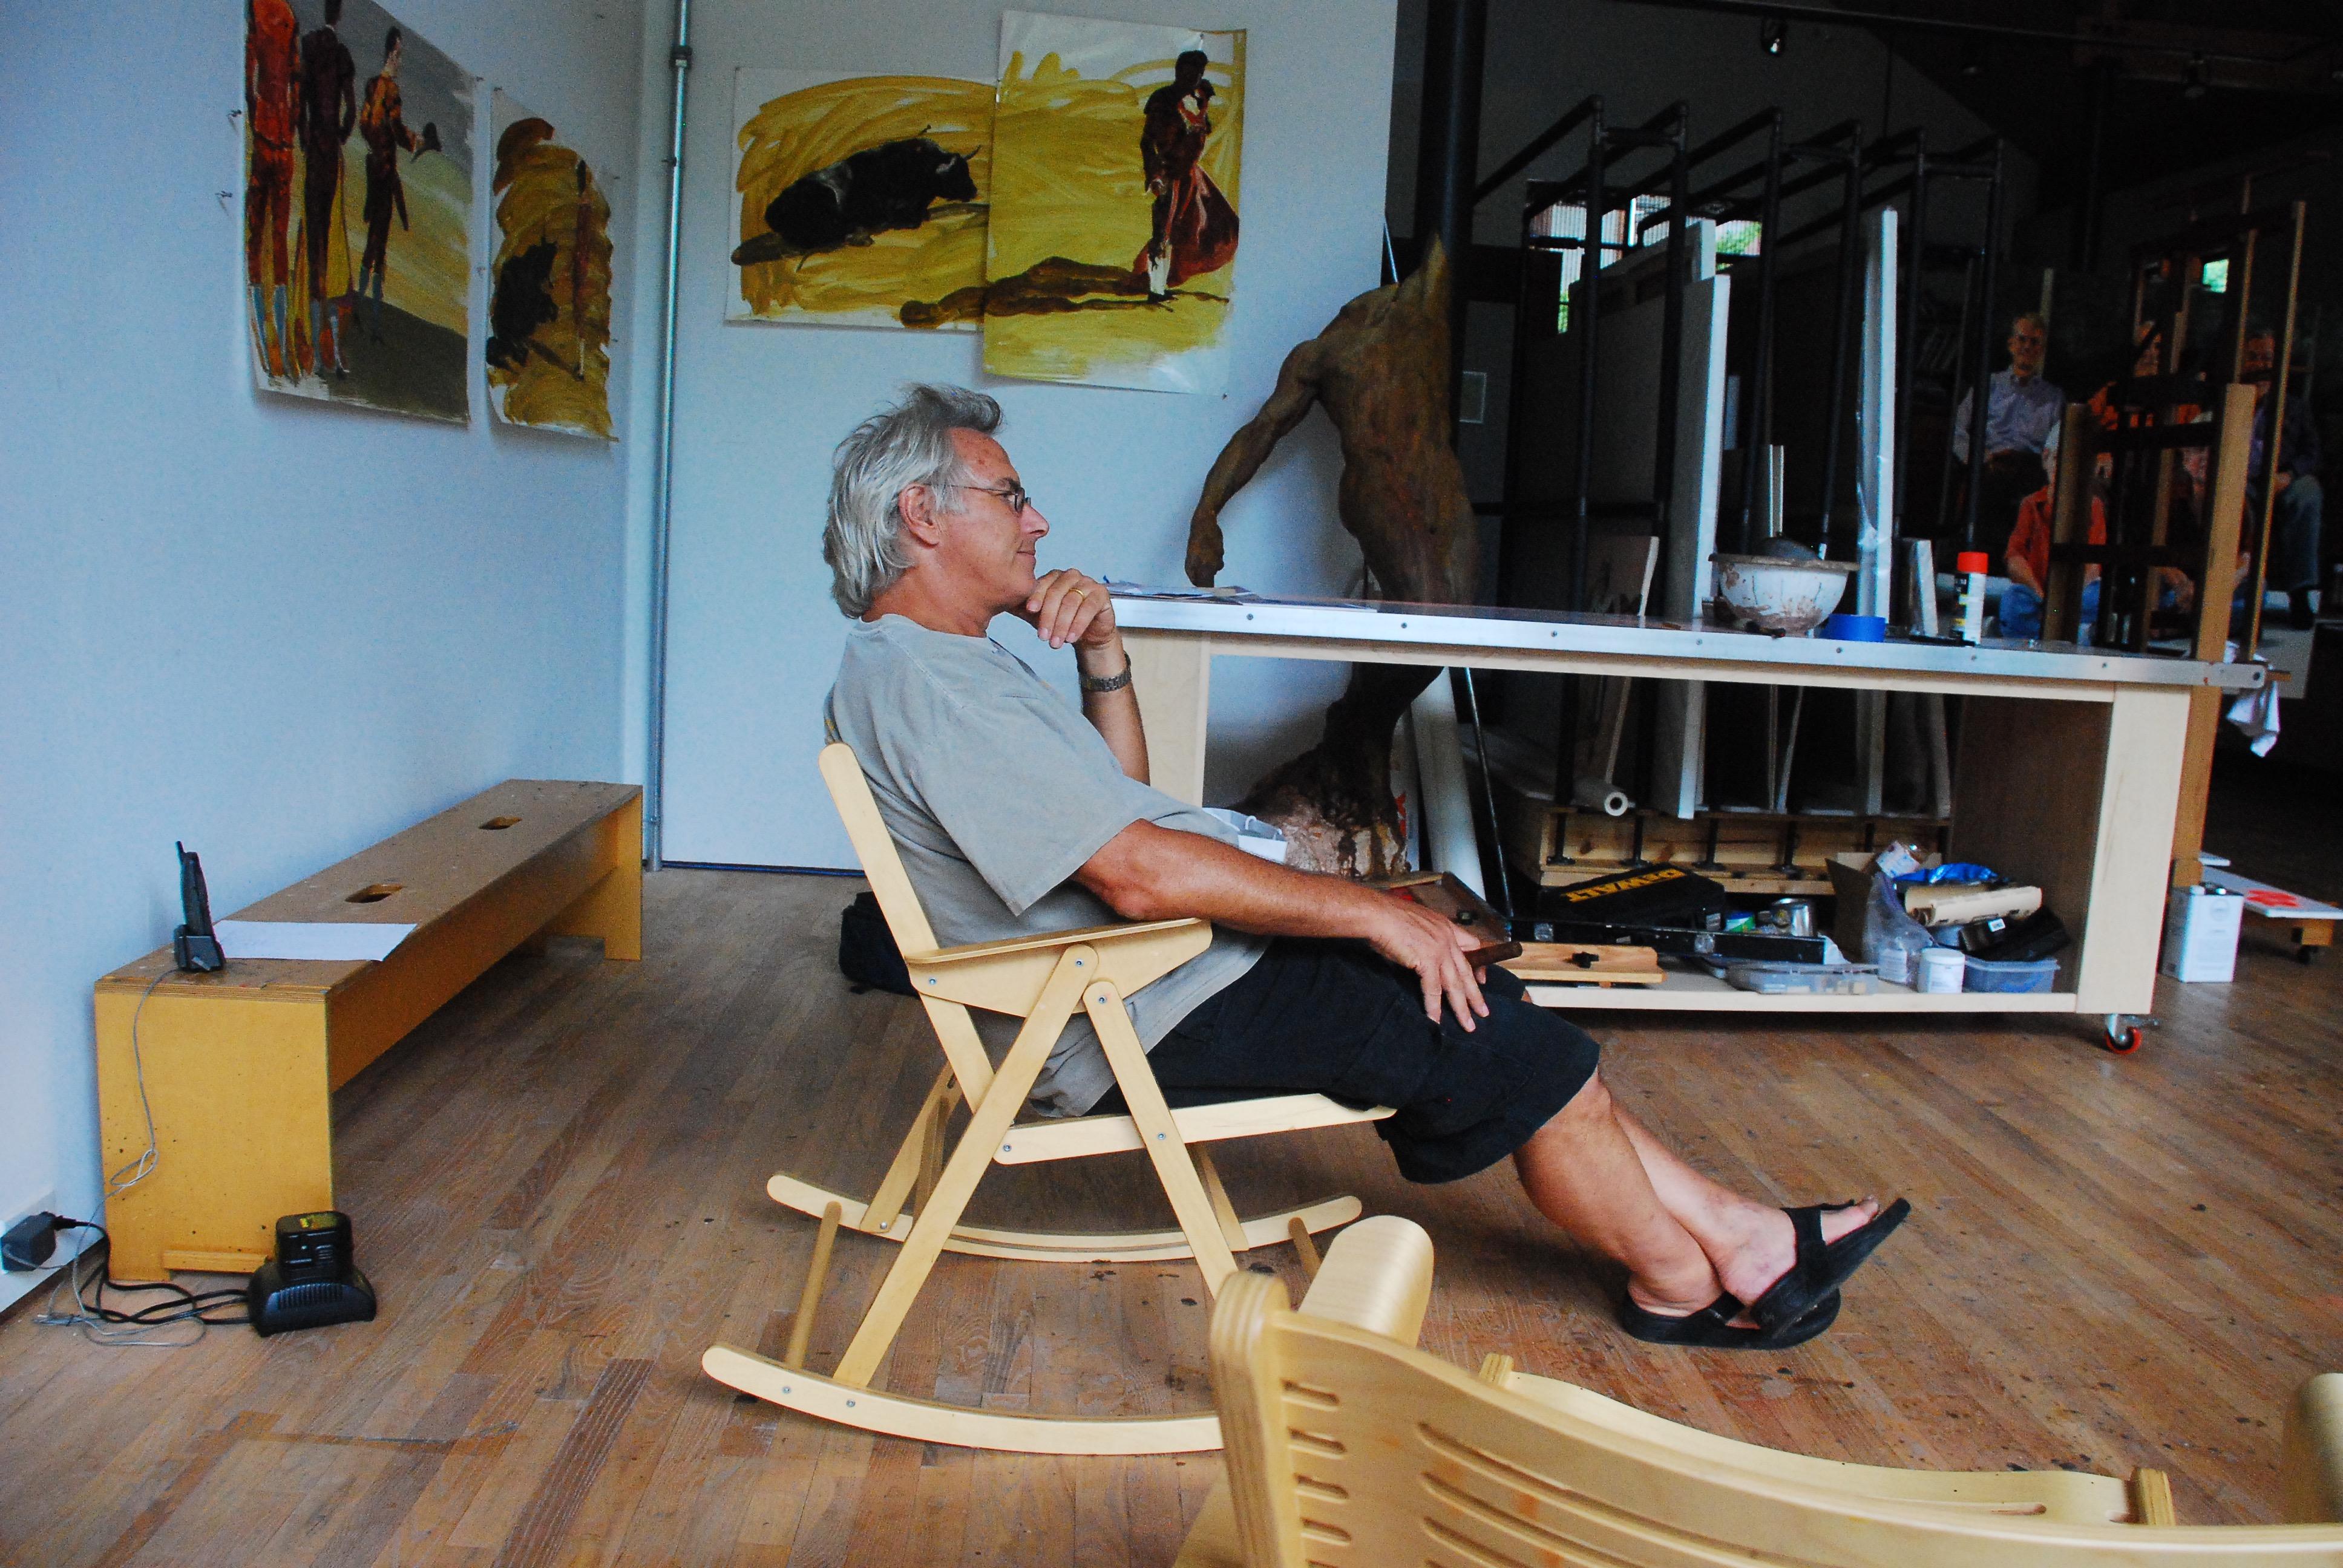 Eric Fischl, Sag Harbor 2004